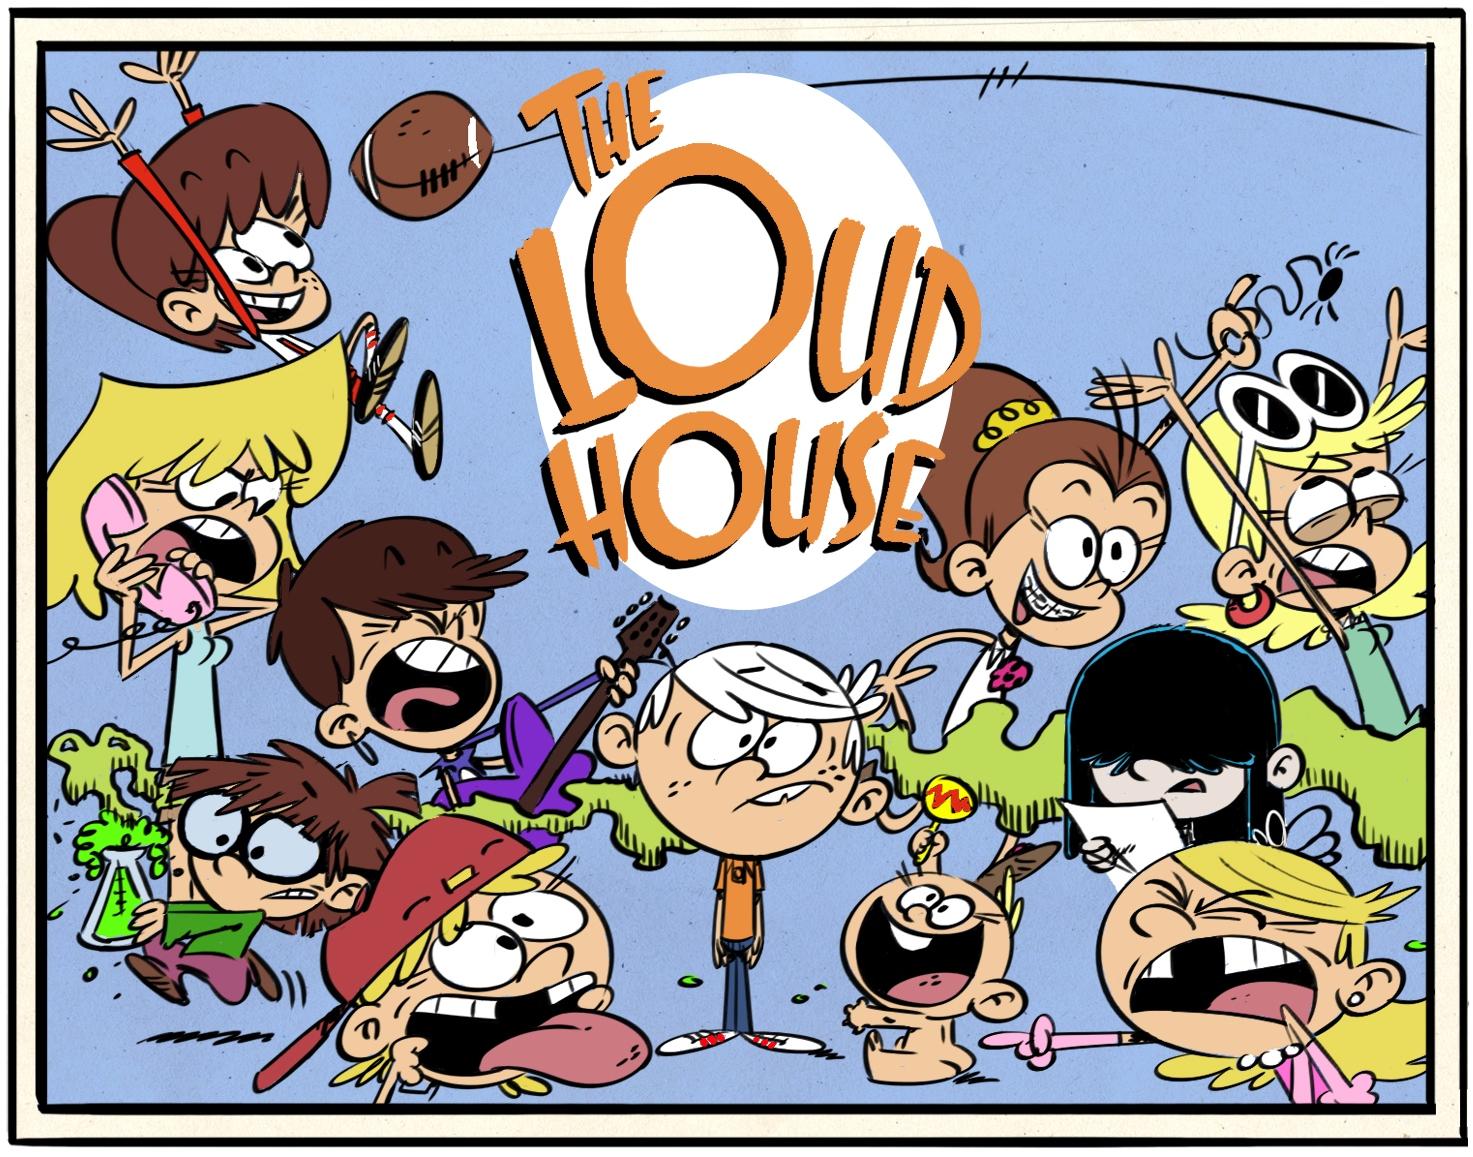 The Loud House